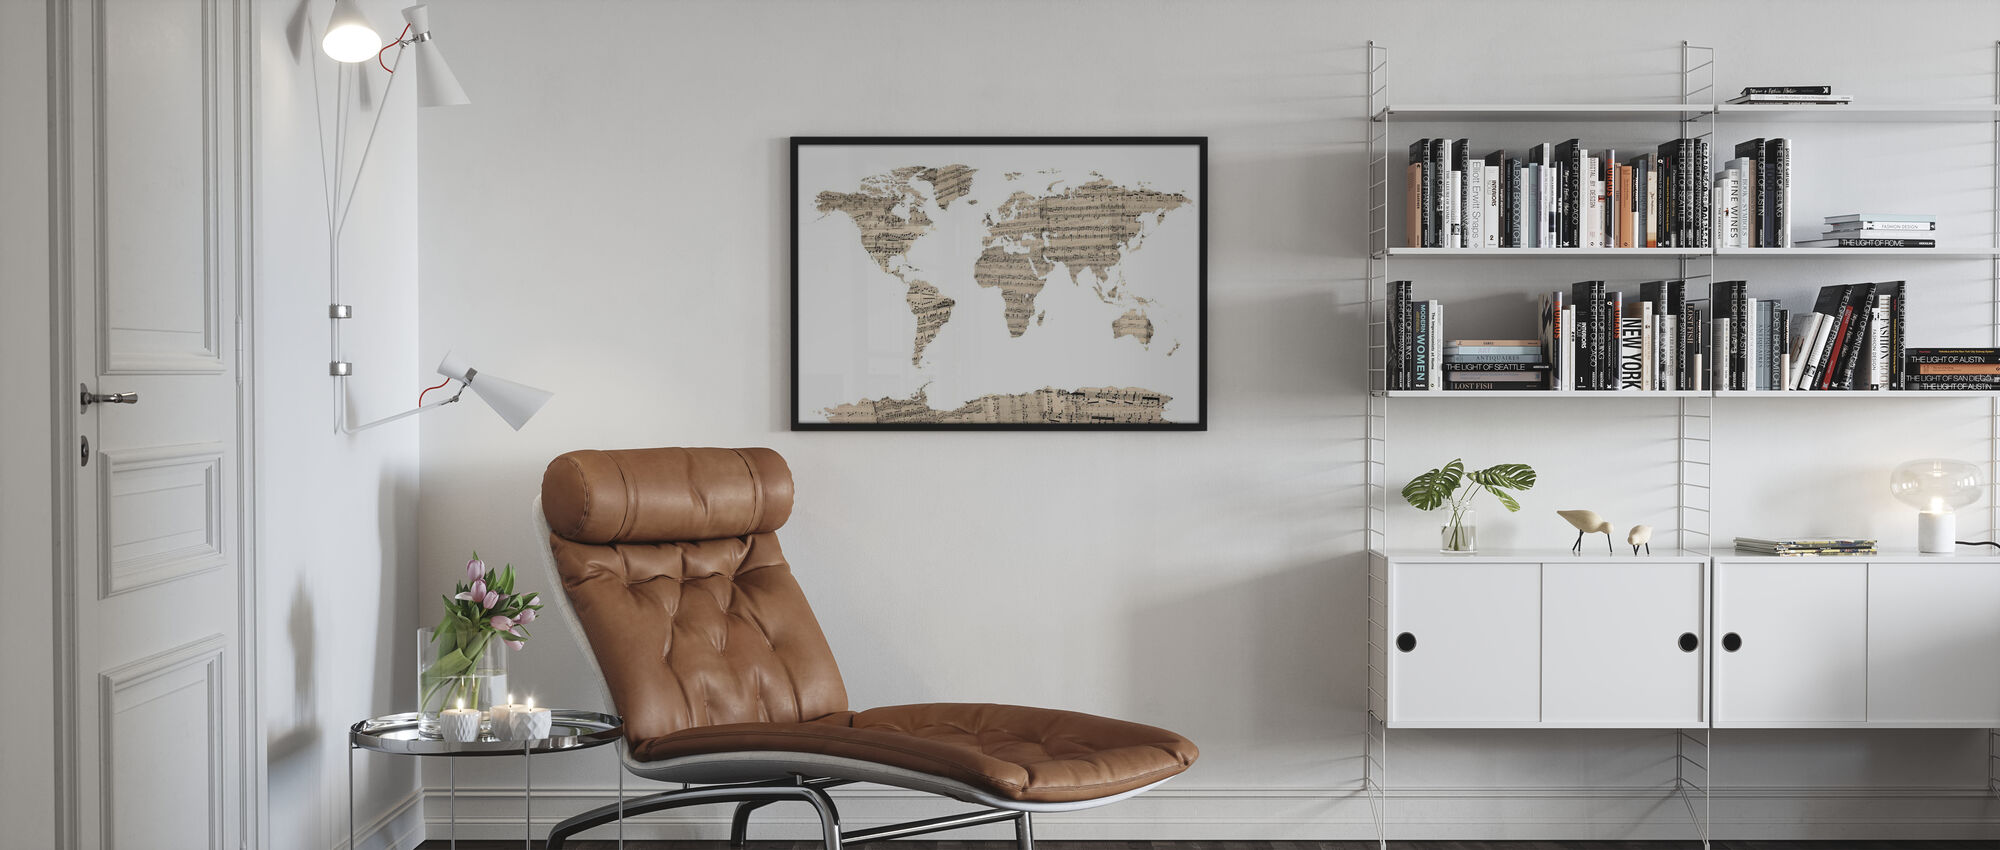 Old Music Sheet World Map - Poster - Living Room